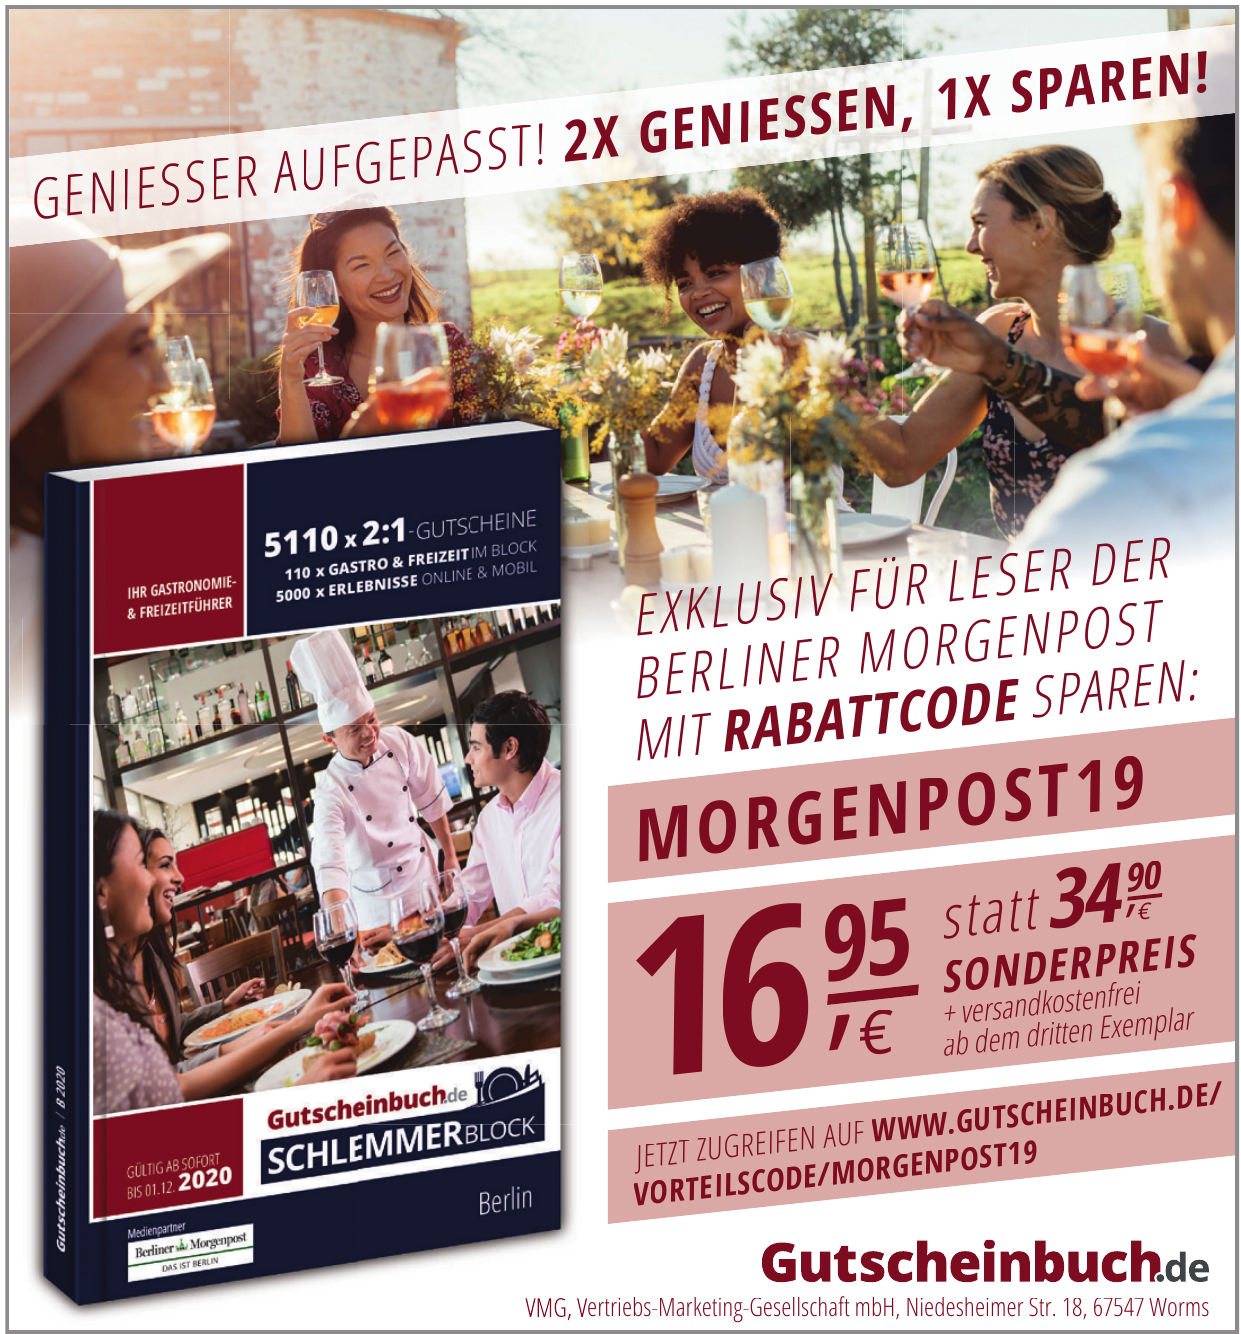 VMG, Vetriebs-Marketing-Geselschaft mbH